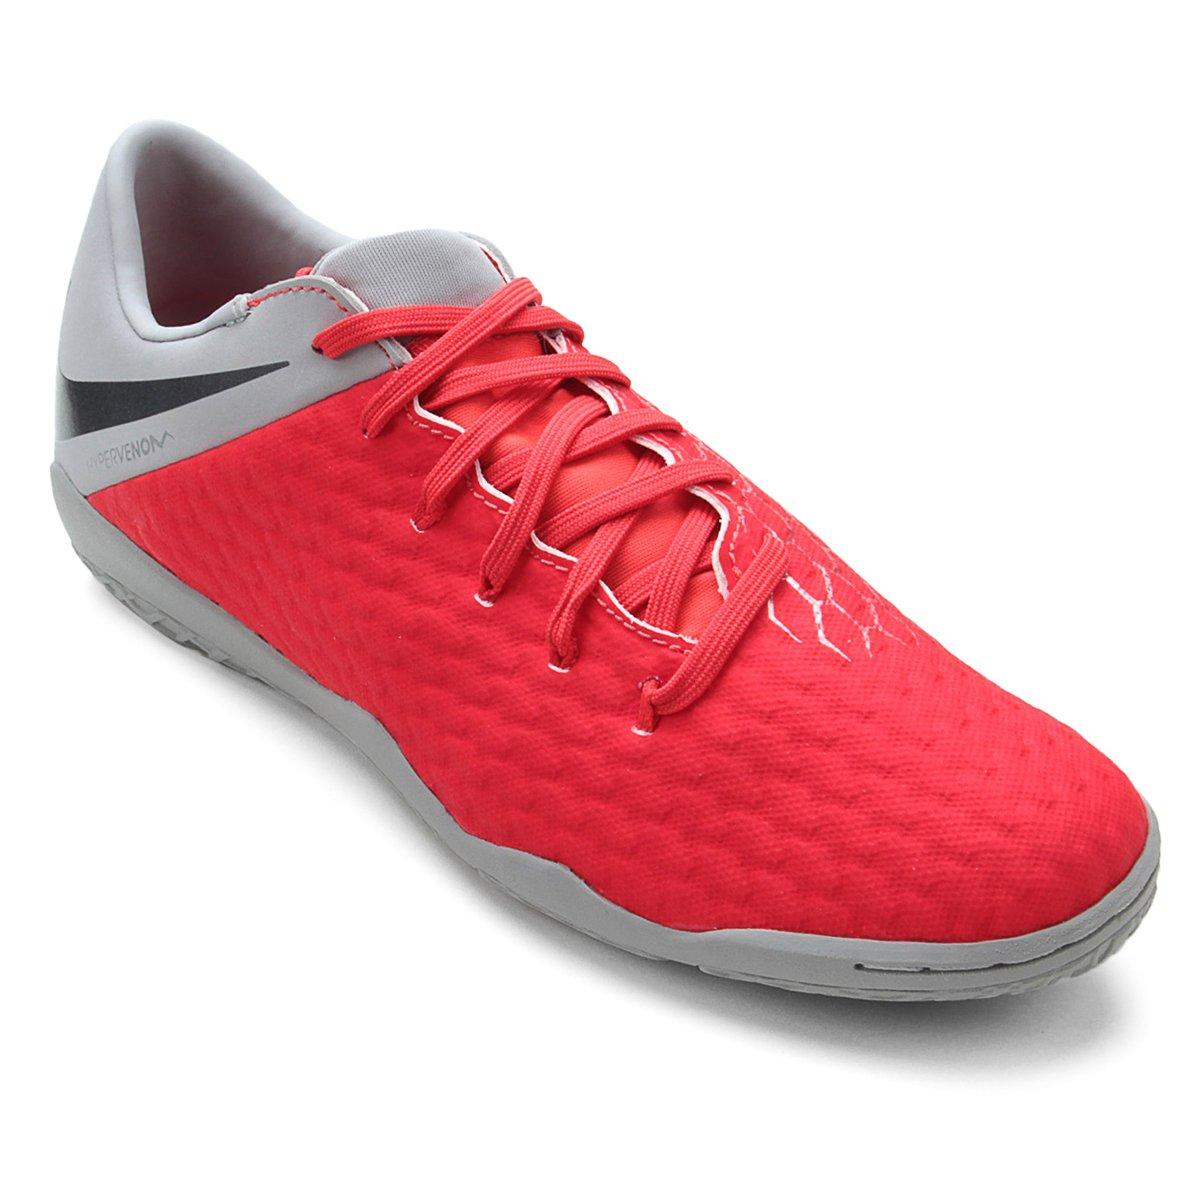 Chuteira Futsal Nike Hypervenom Phantom 3 Academy IC - Compre Agora ... fccd6224a781c